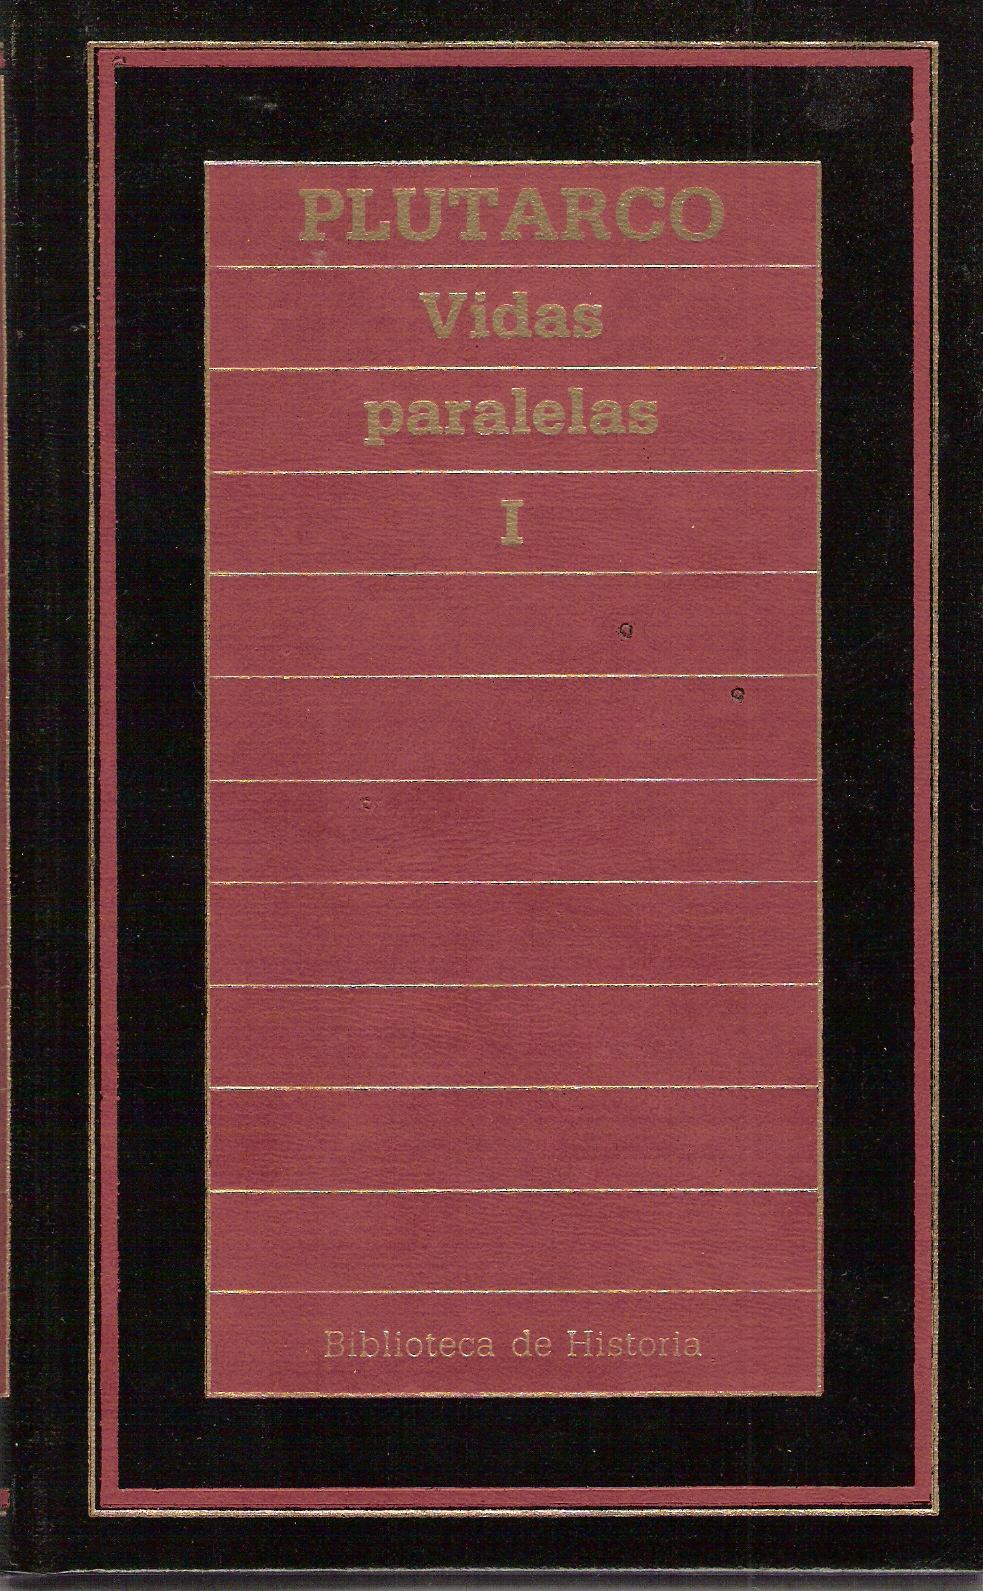 Vidas paralelas I